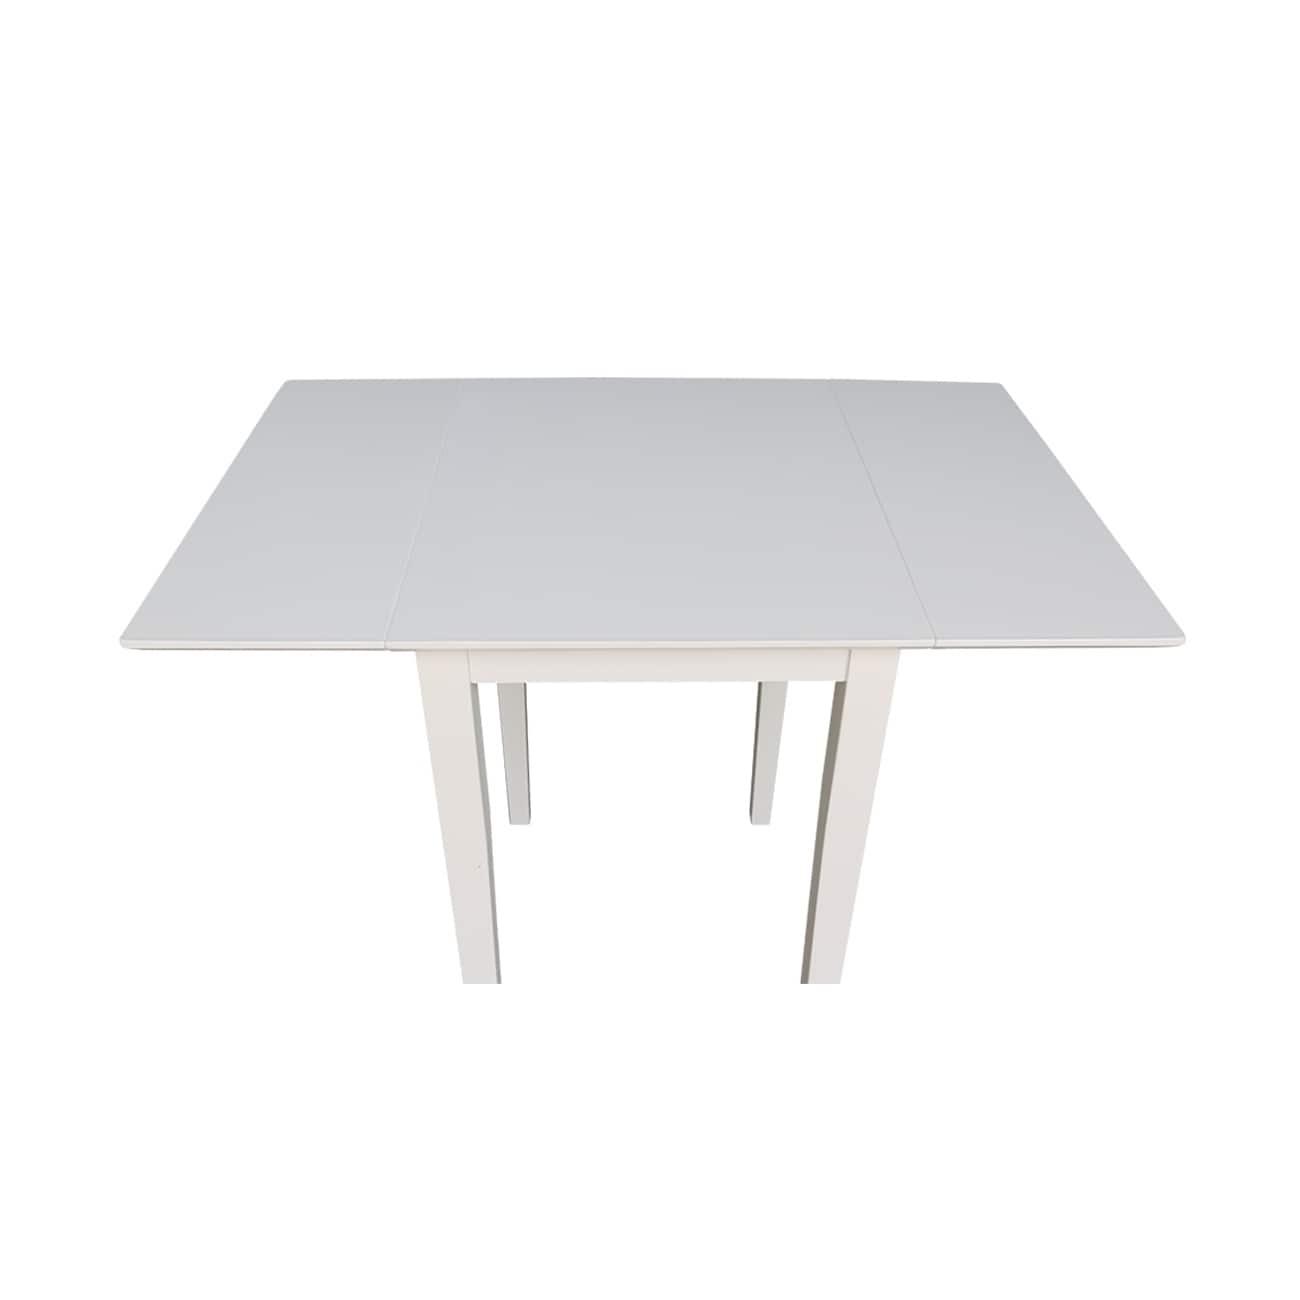 Den Mandel White Small Dropleaf Table